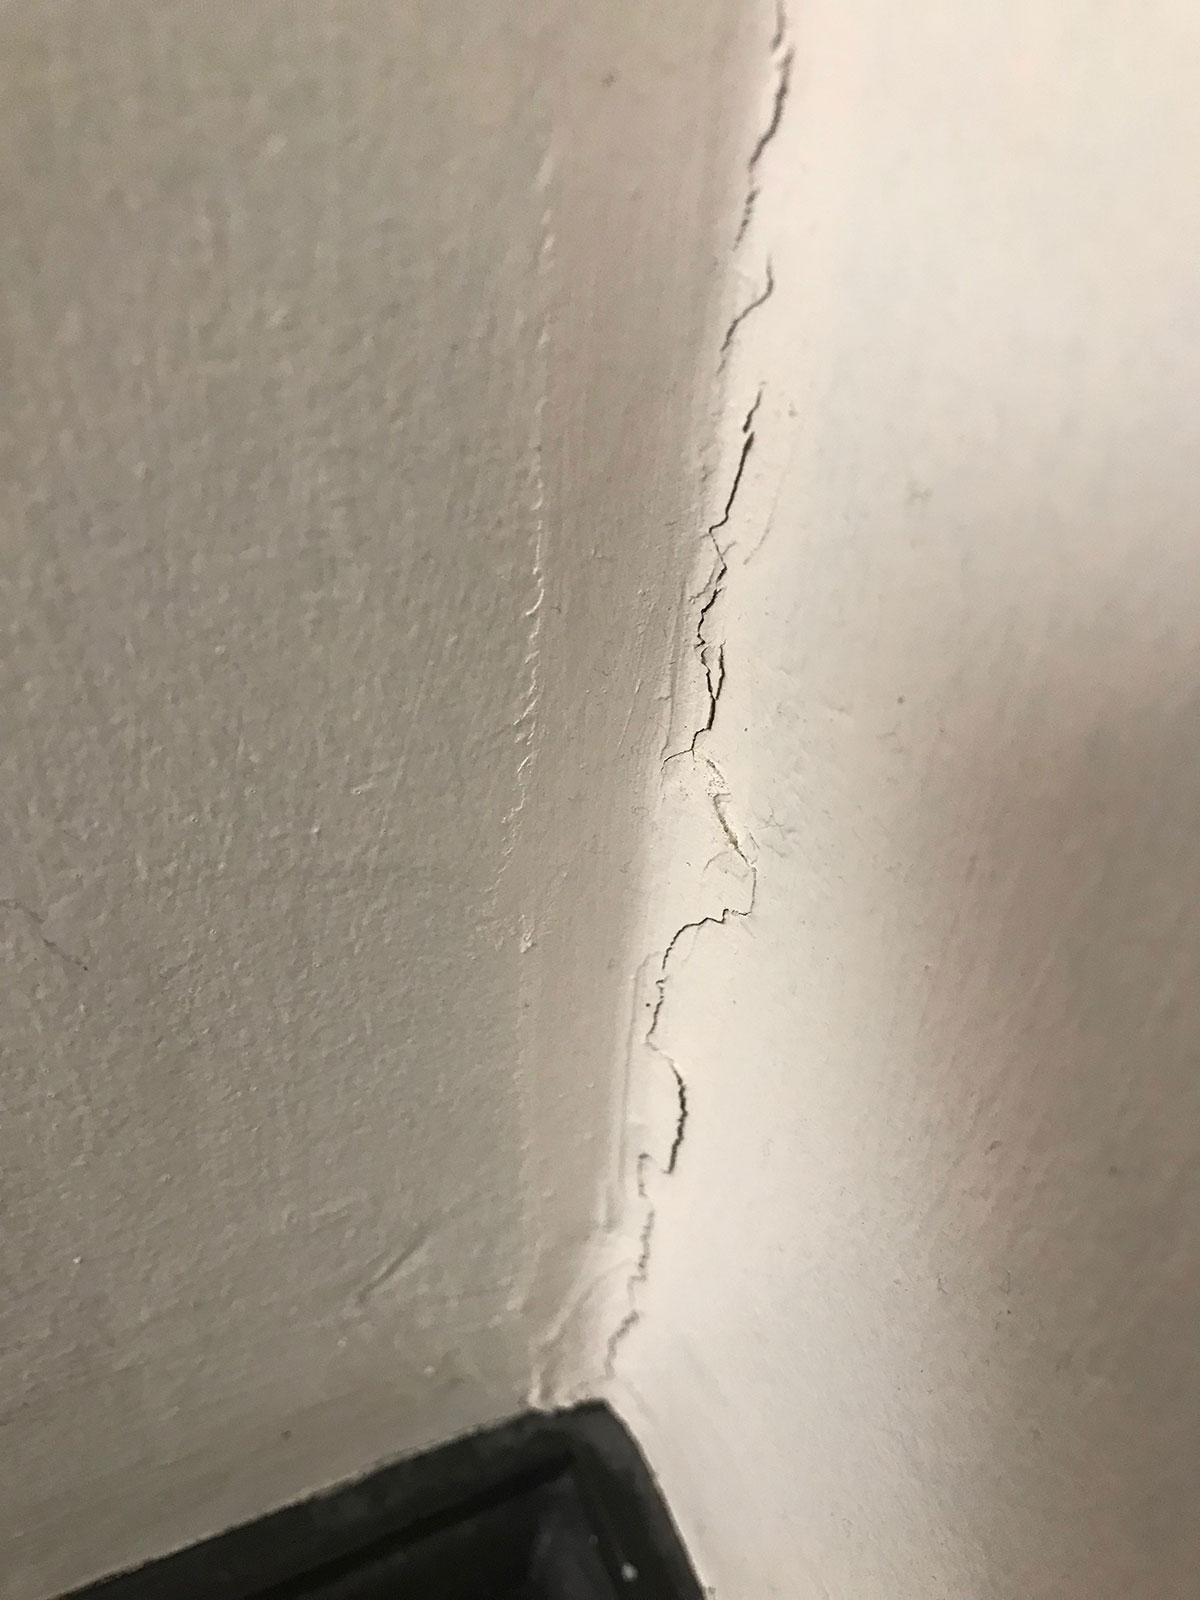 house paint cracks